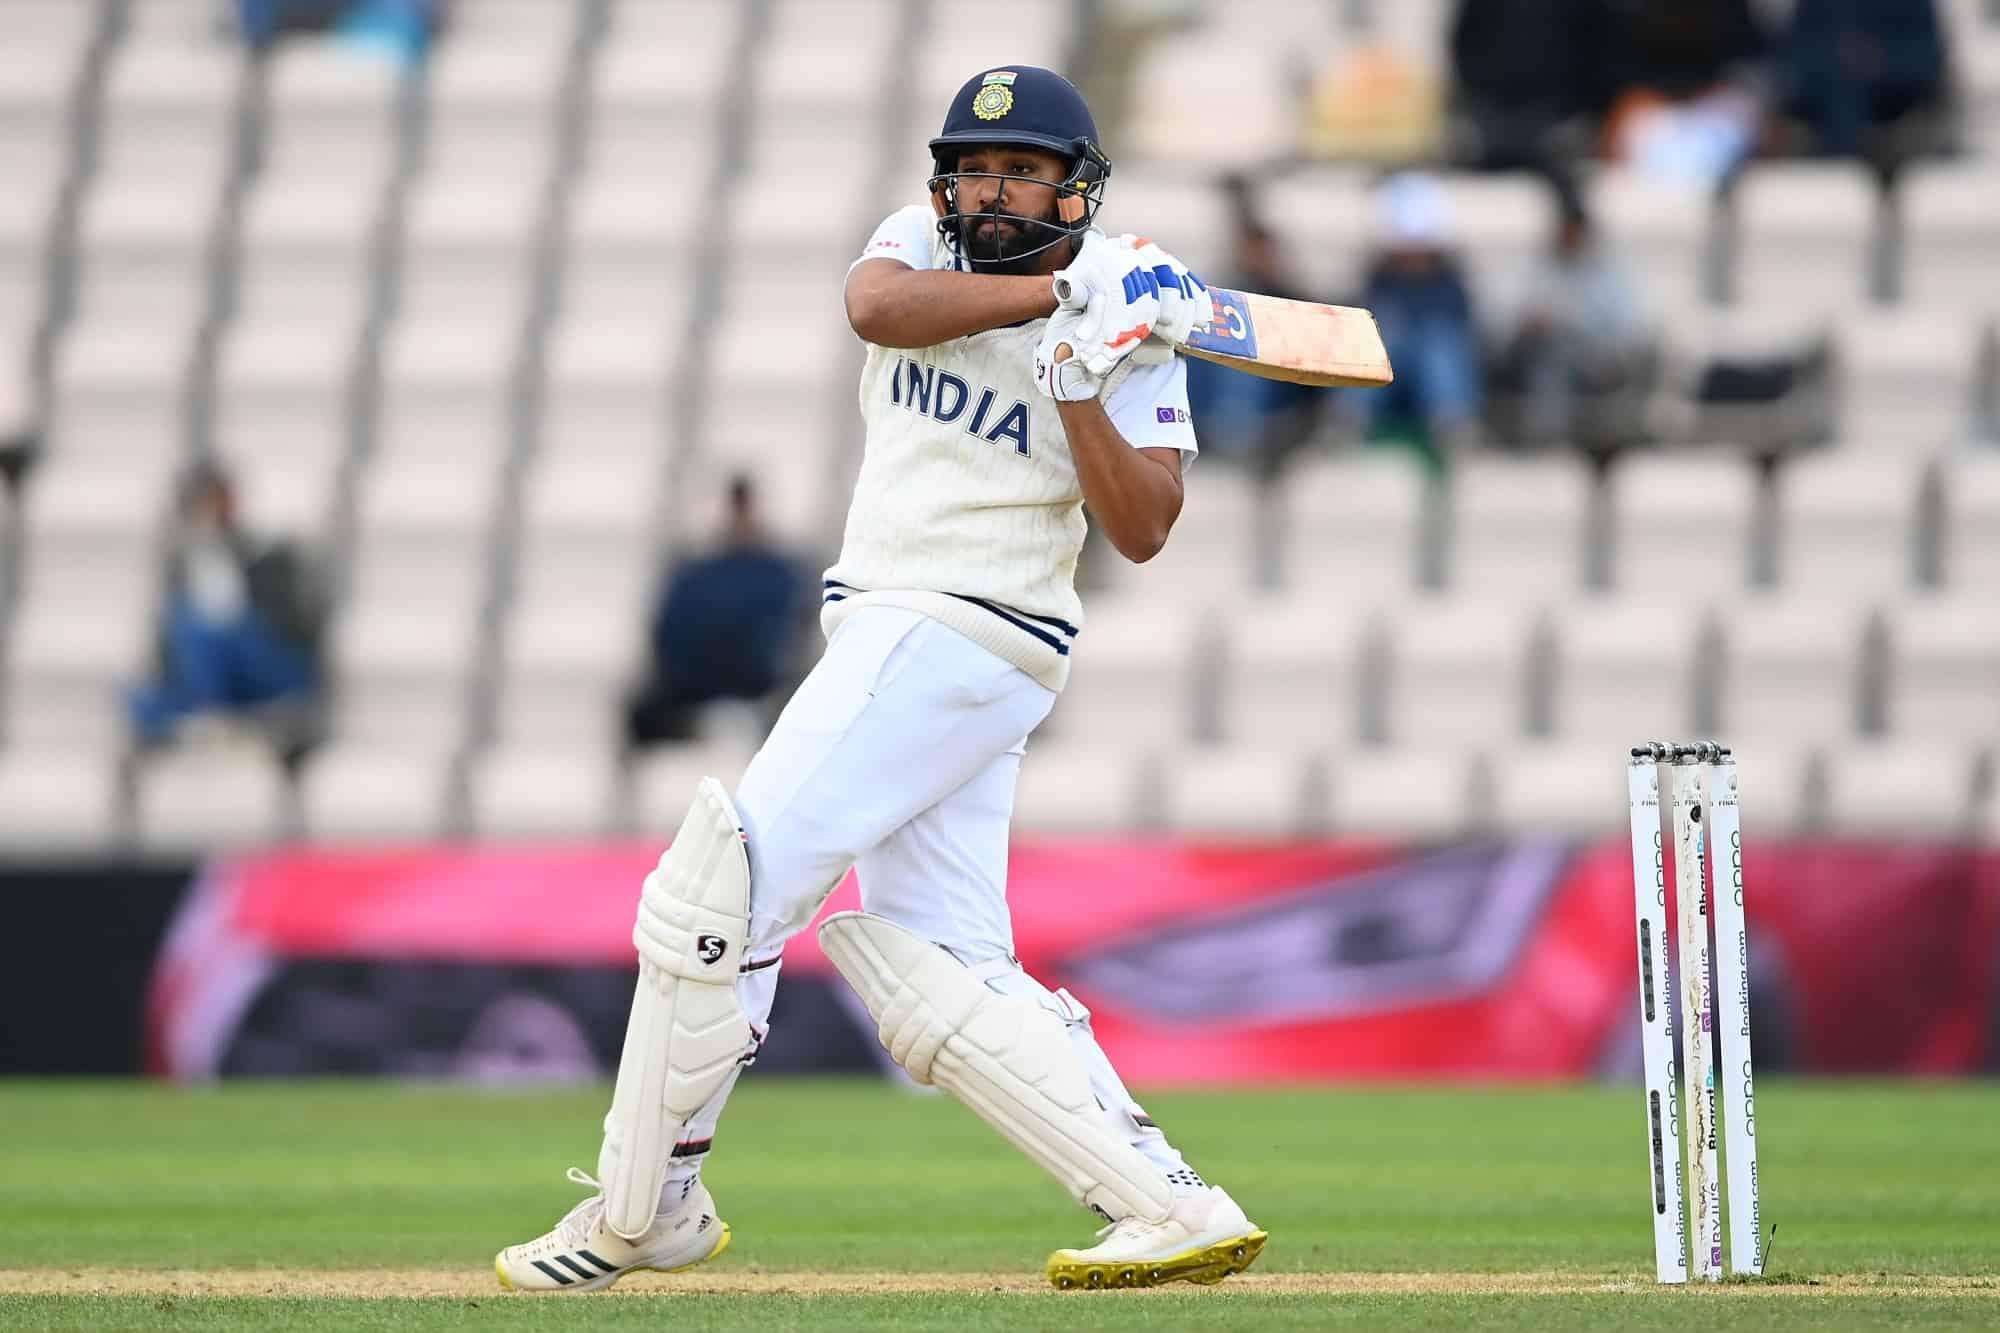 Rohit Sharma in World Test Championship 2019-21